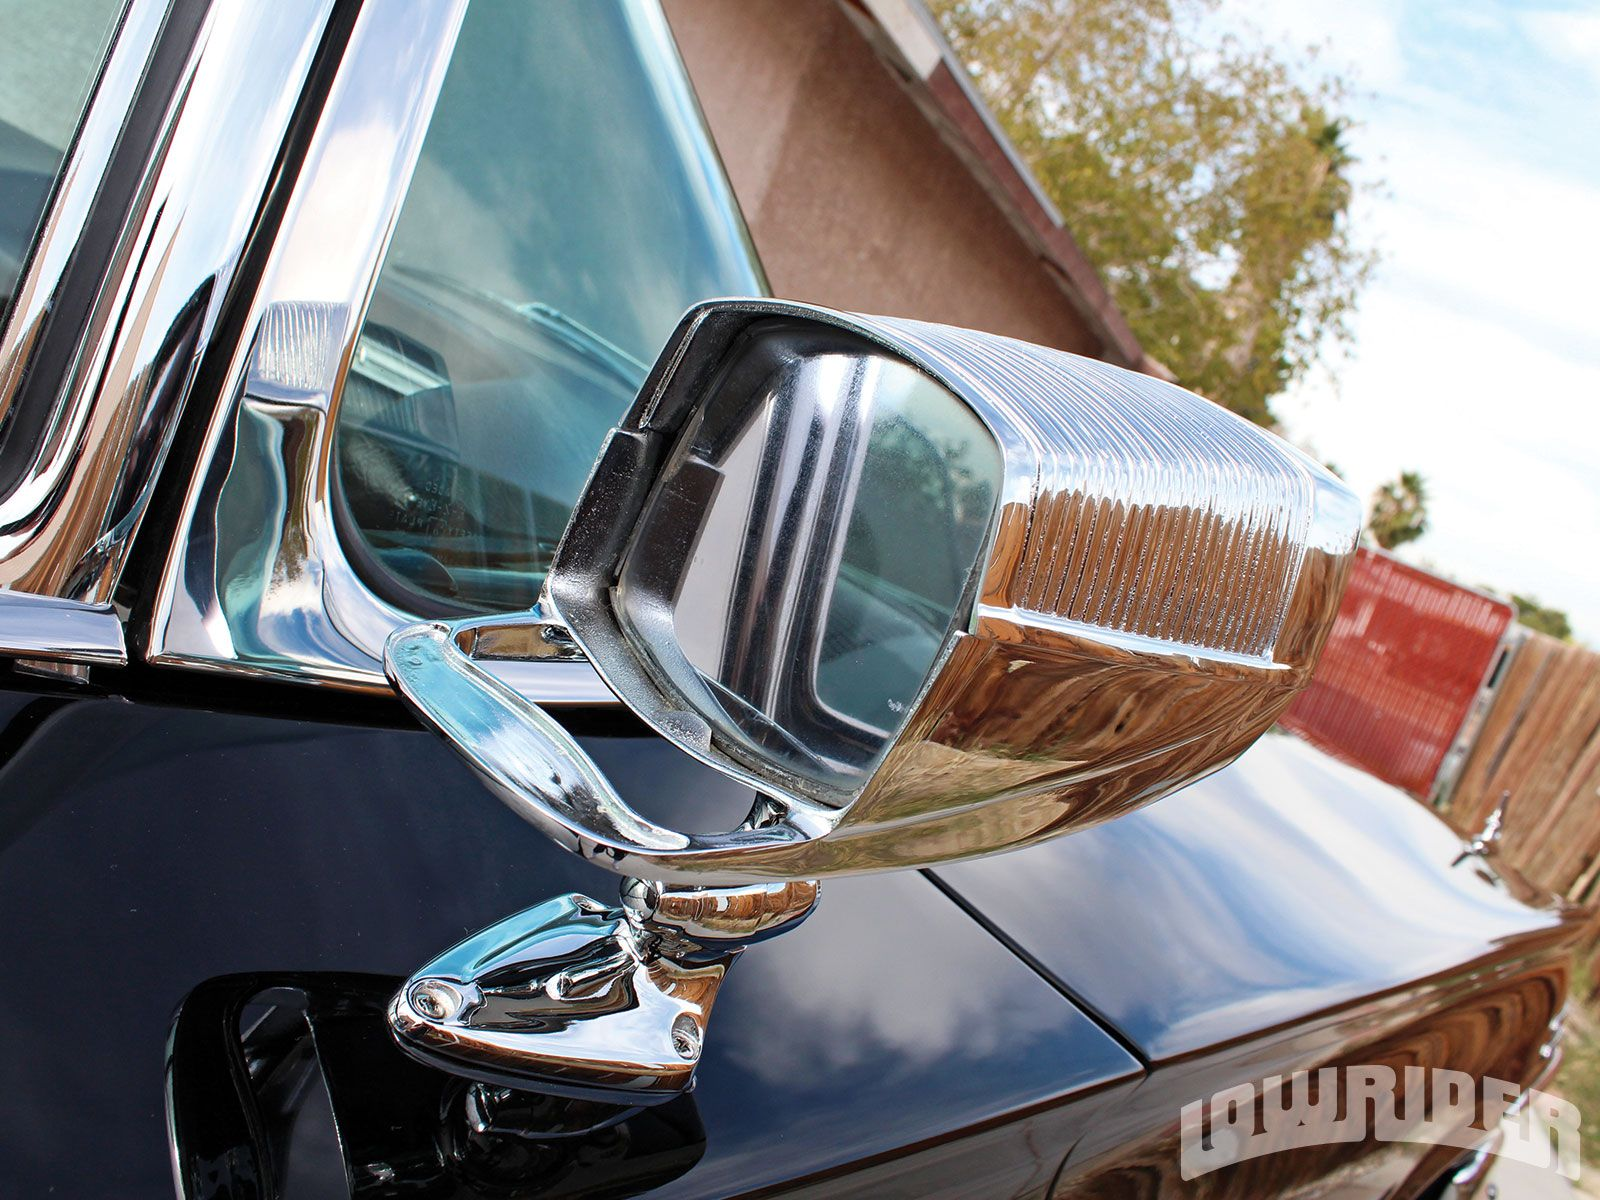 07 1960 Chevrolet Impala Convertible Nuvue Spotlight